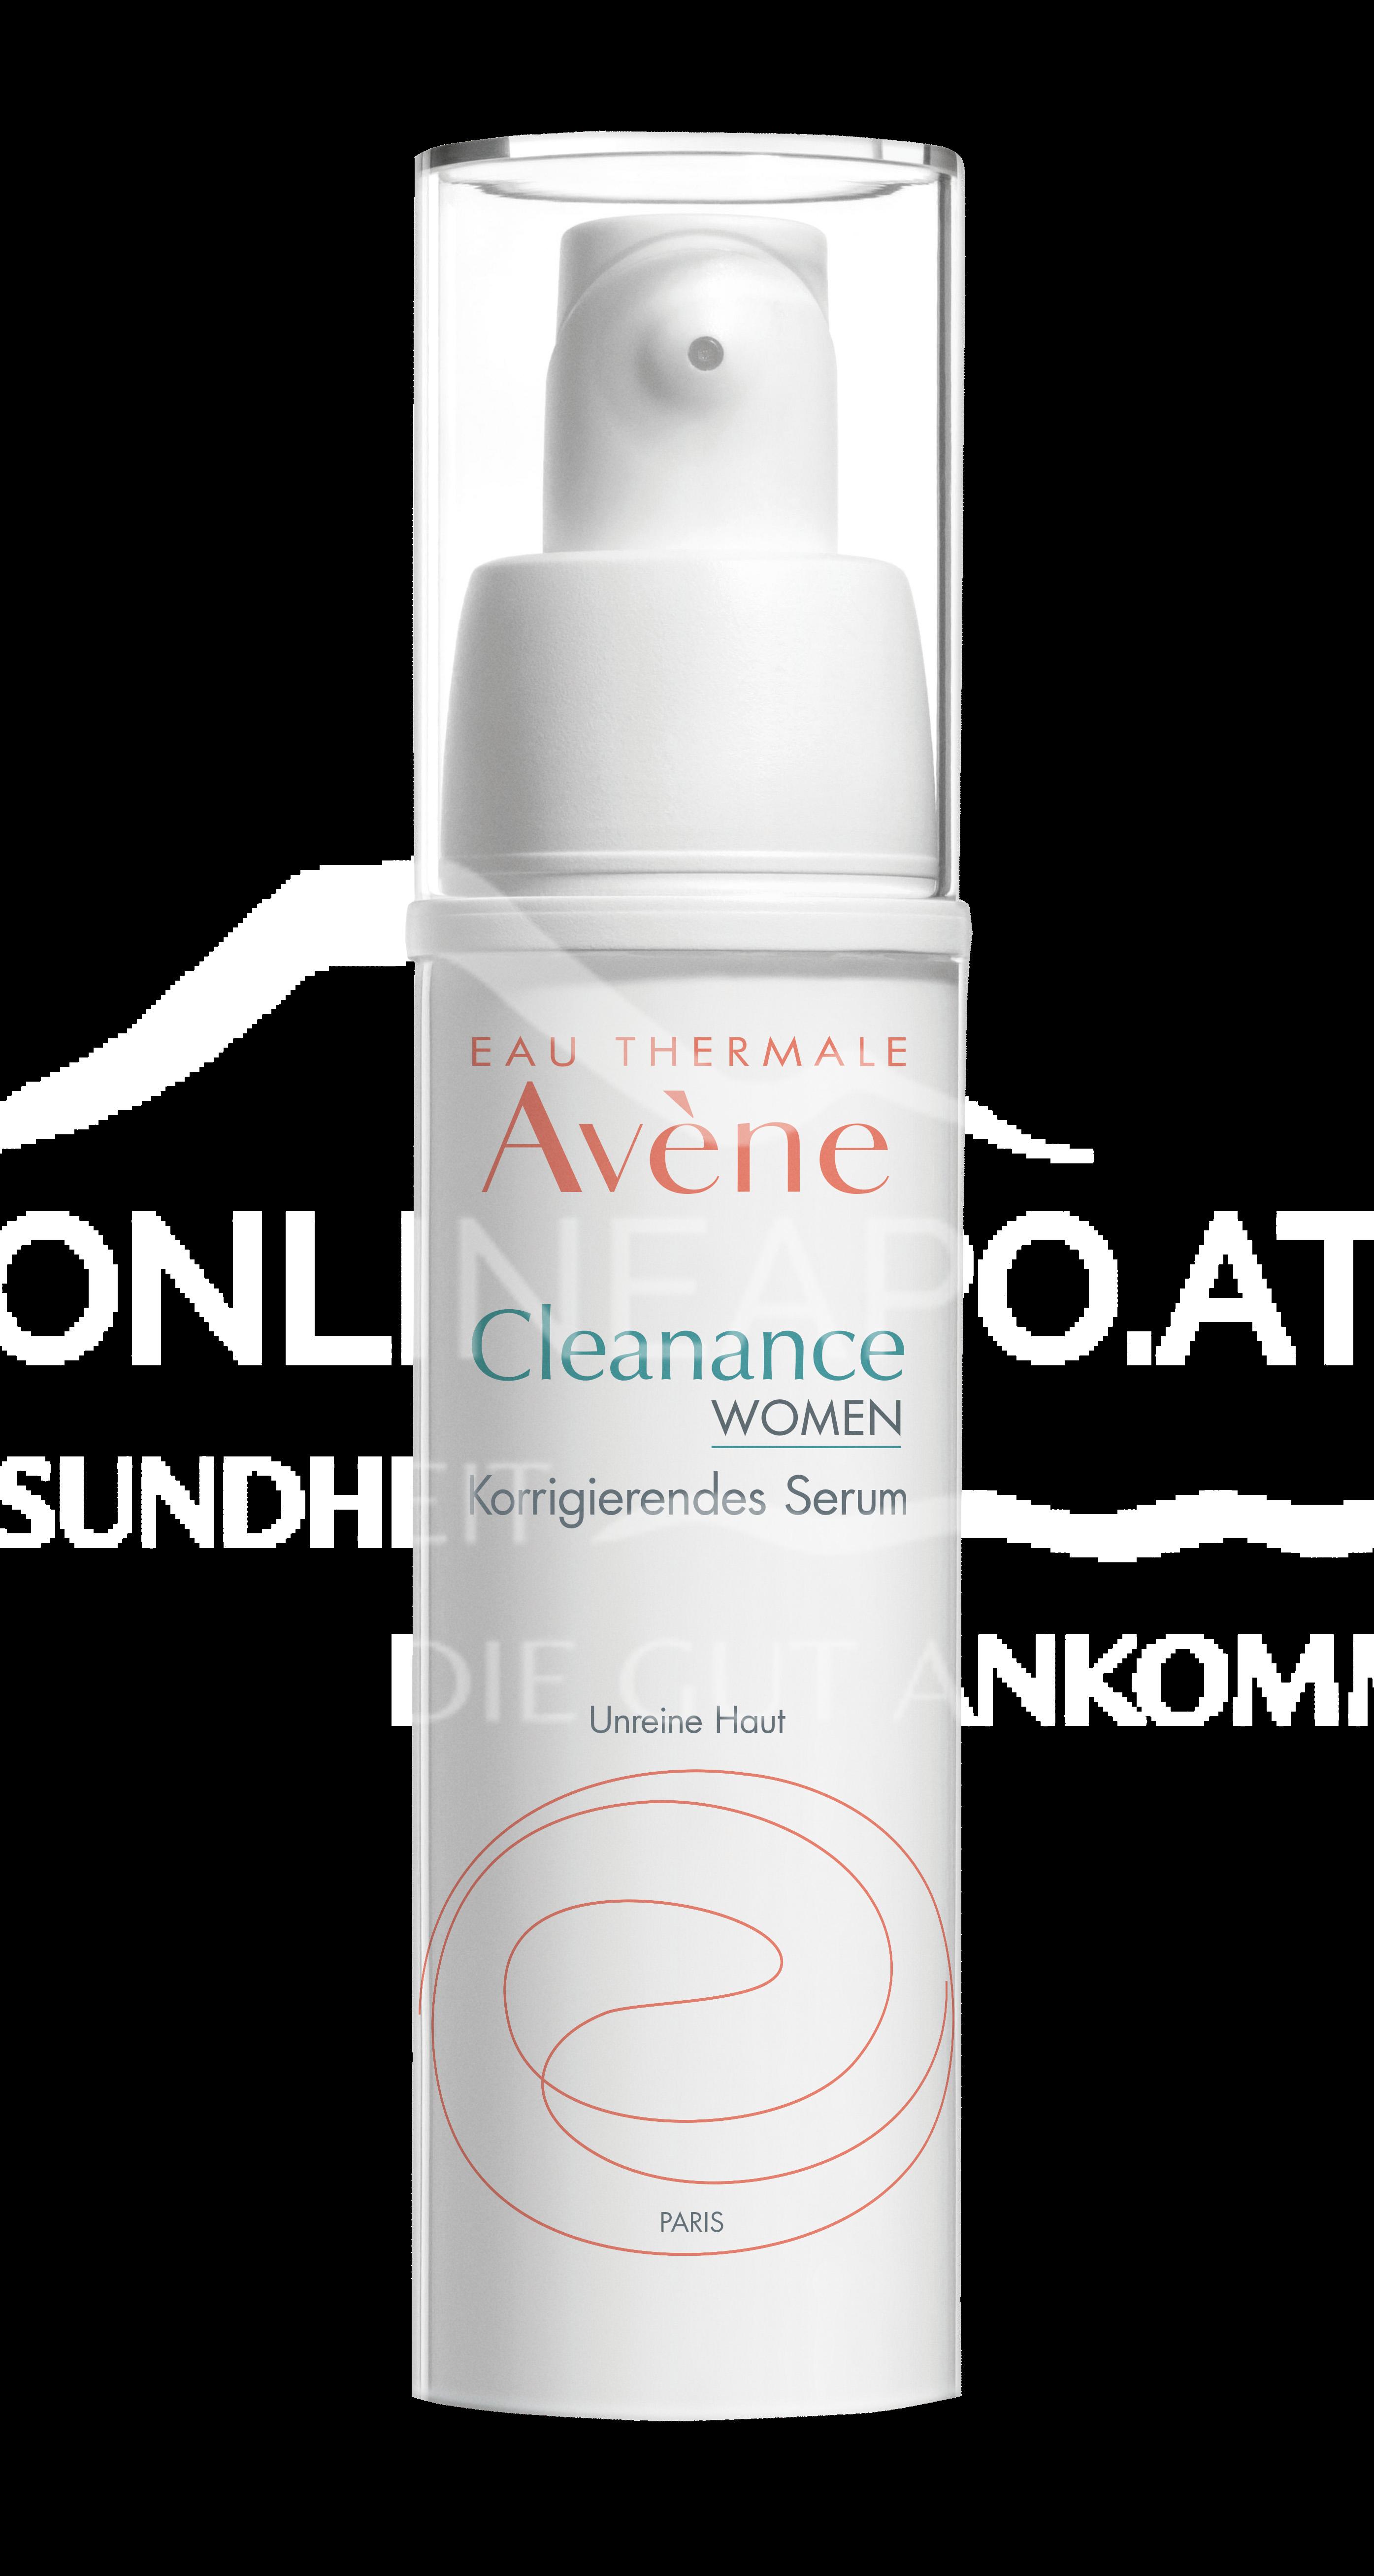 Avene Cleanance WOMEN Korrigierendes Serum